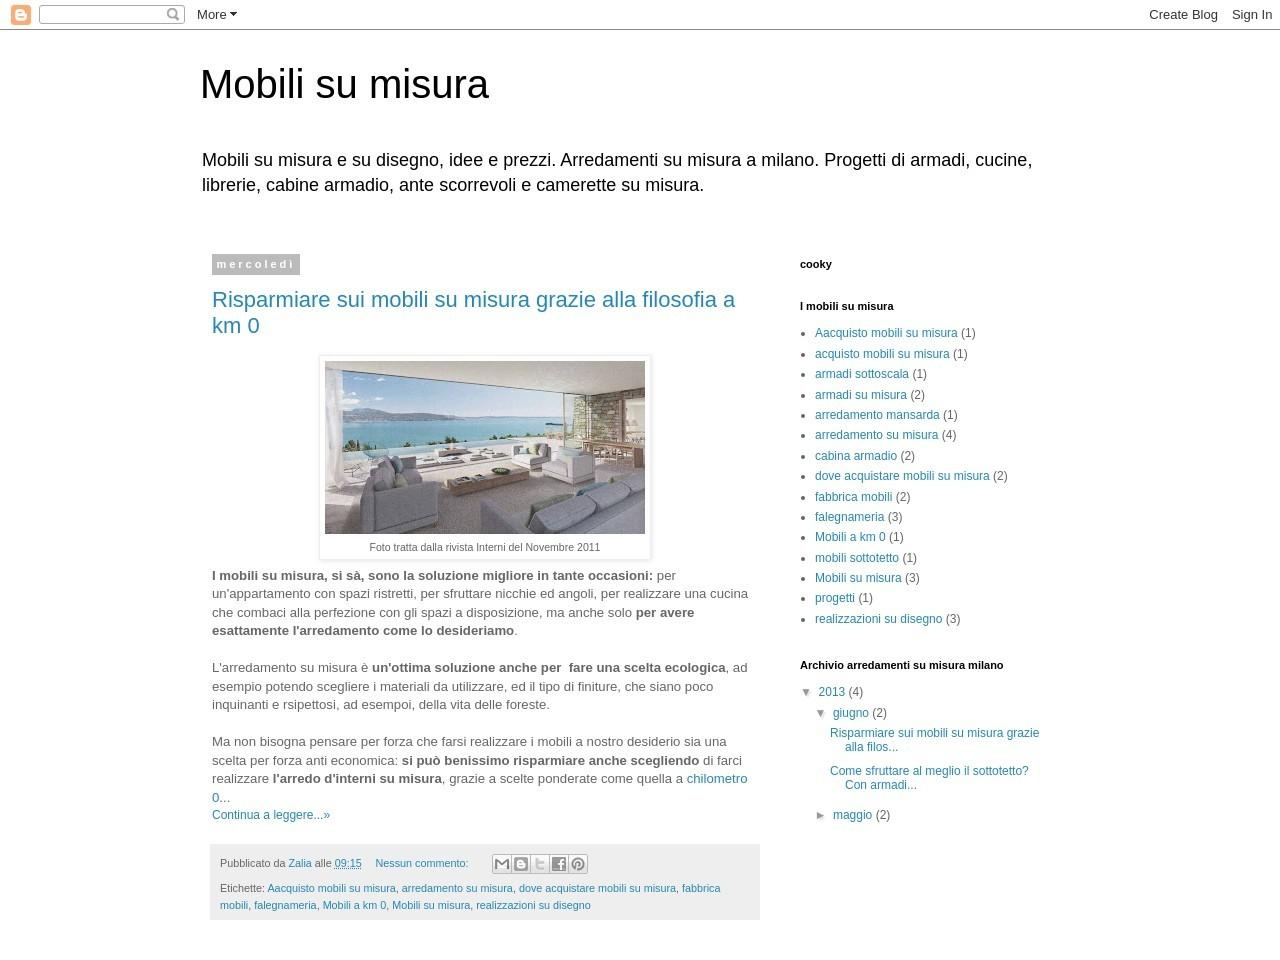 mobili-su-misura